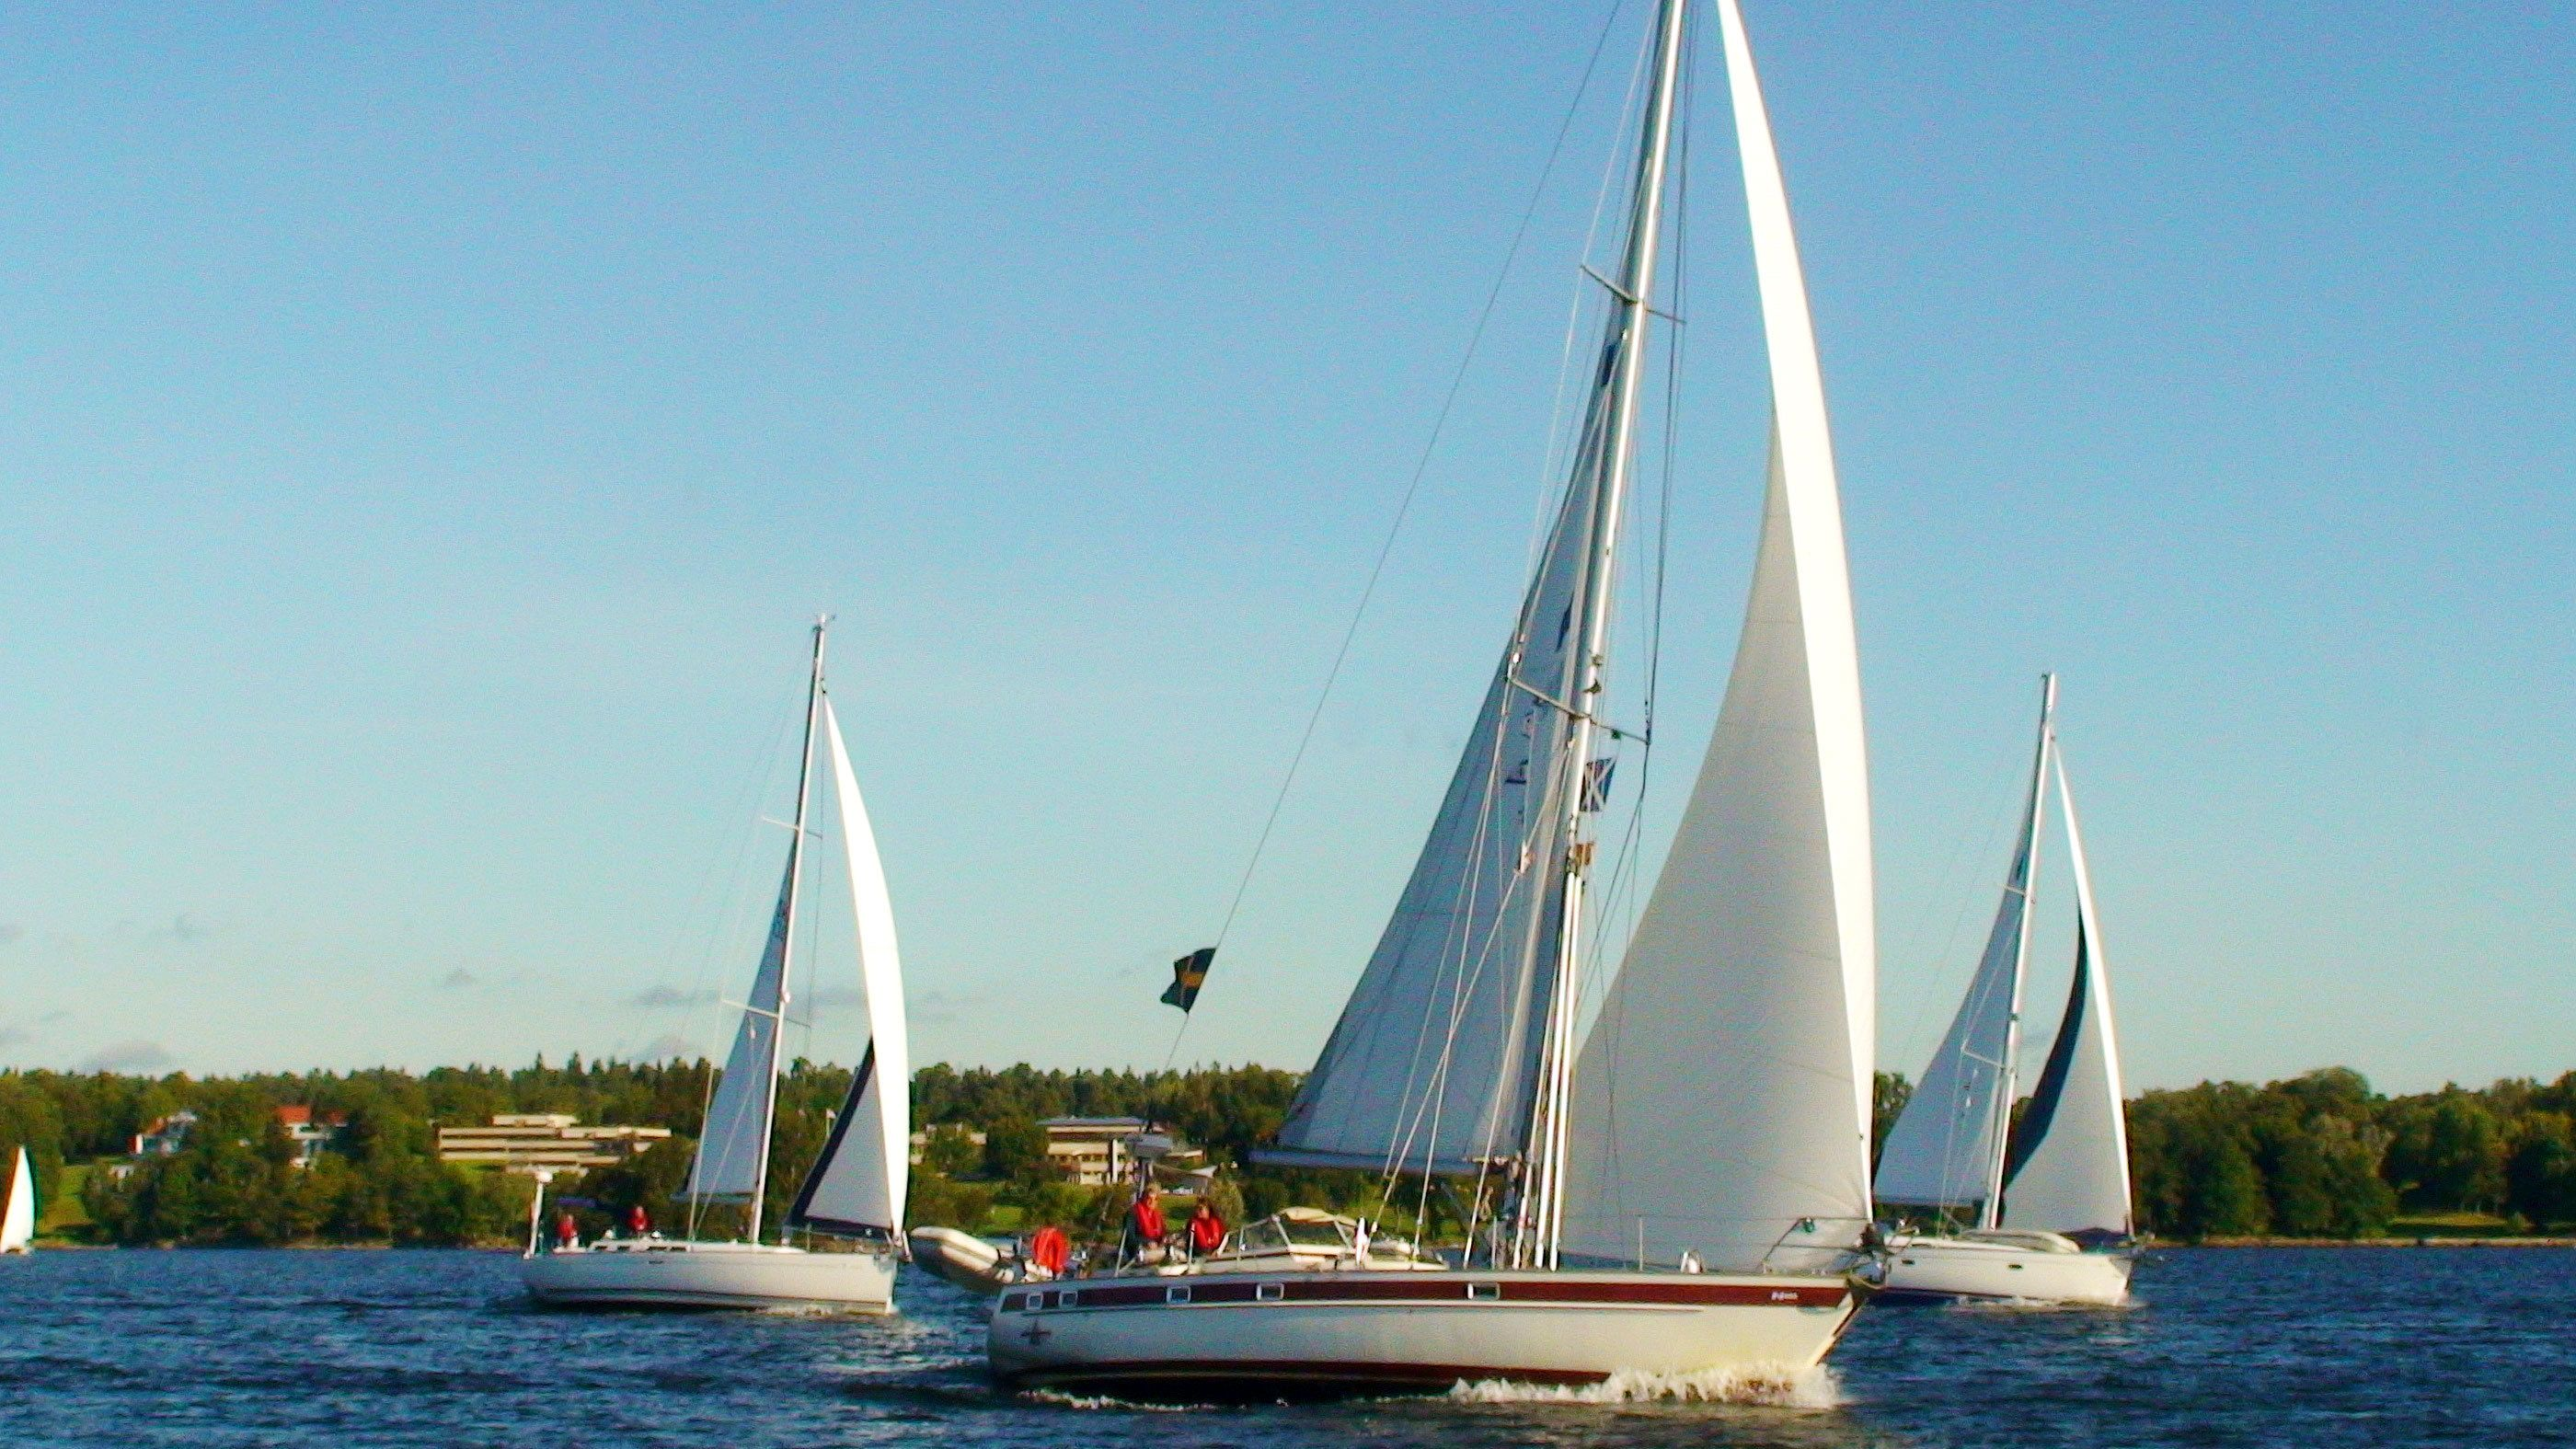 Three sailboats at full sail in Stockholm Archipelago